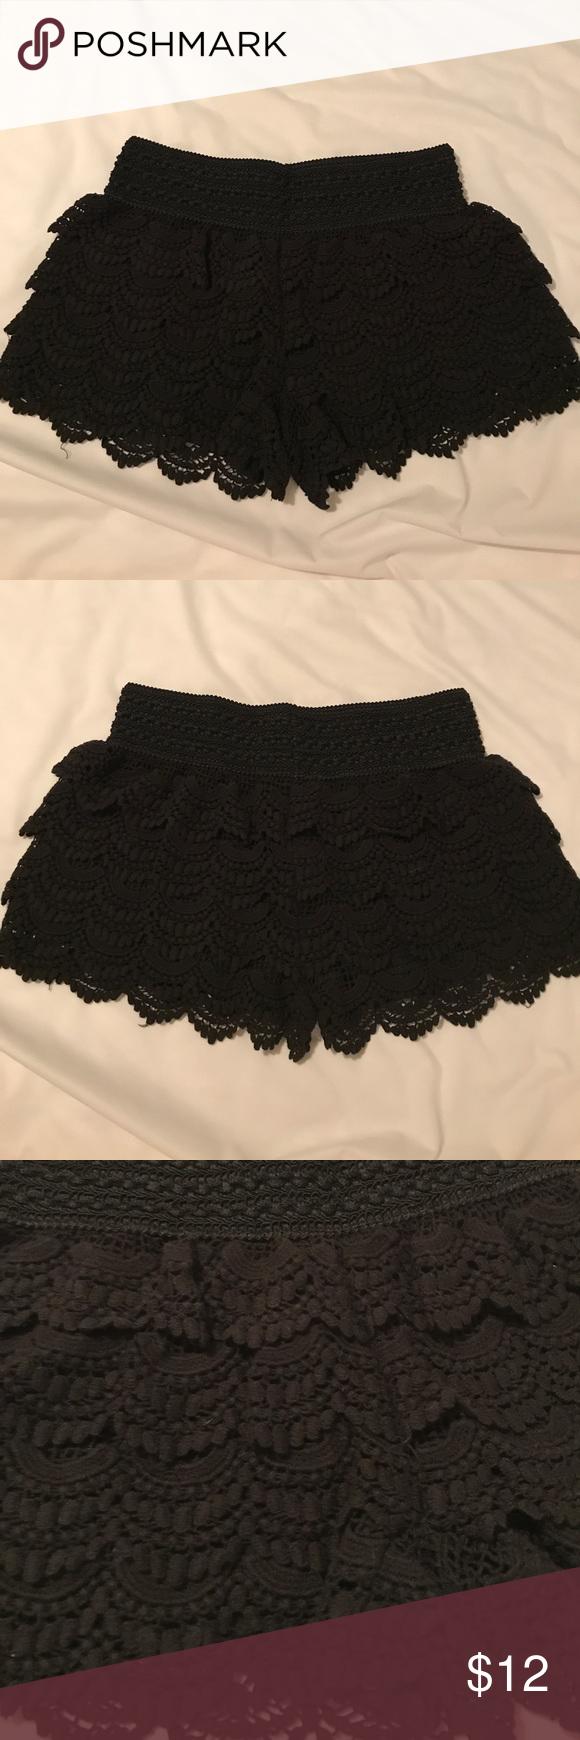 American Rag shorts Black American Rag Shorts